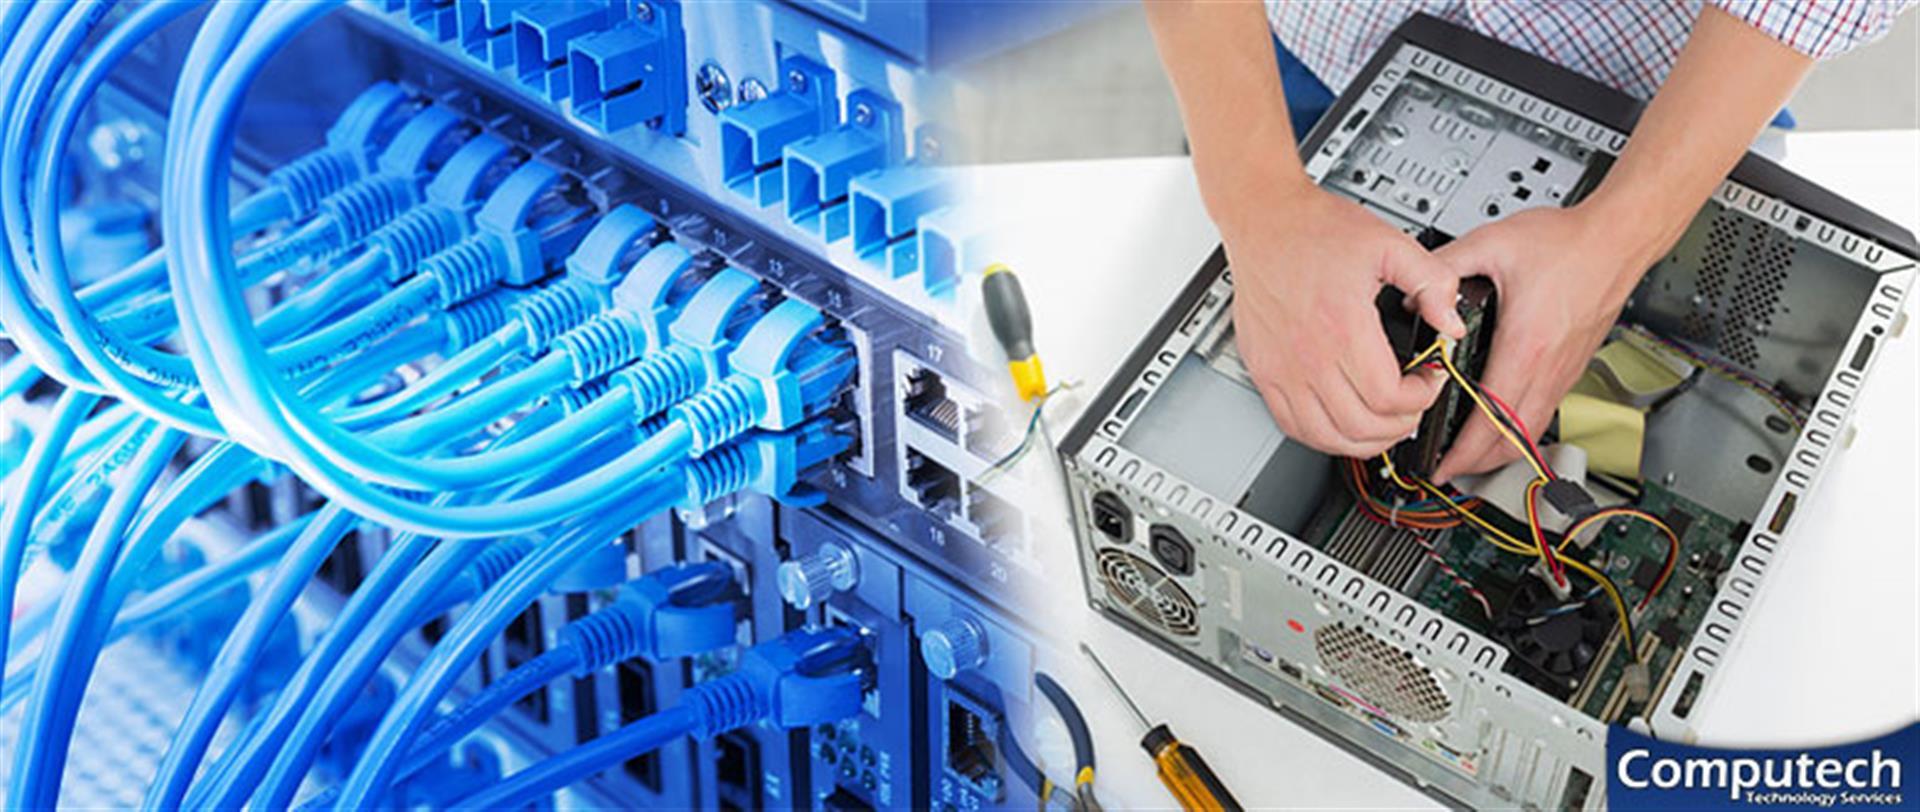 Cusseta Georgia On Site Computer PC & Printer Repair, Networks, Voice & Data Cabling Solutions